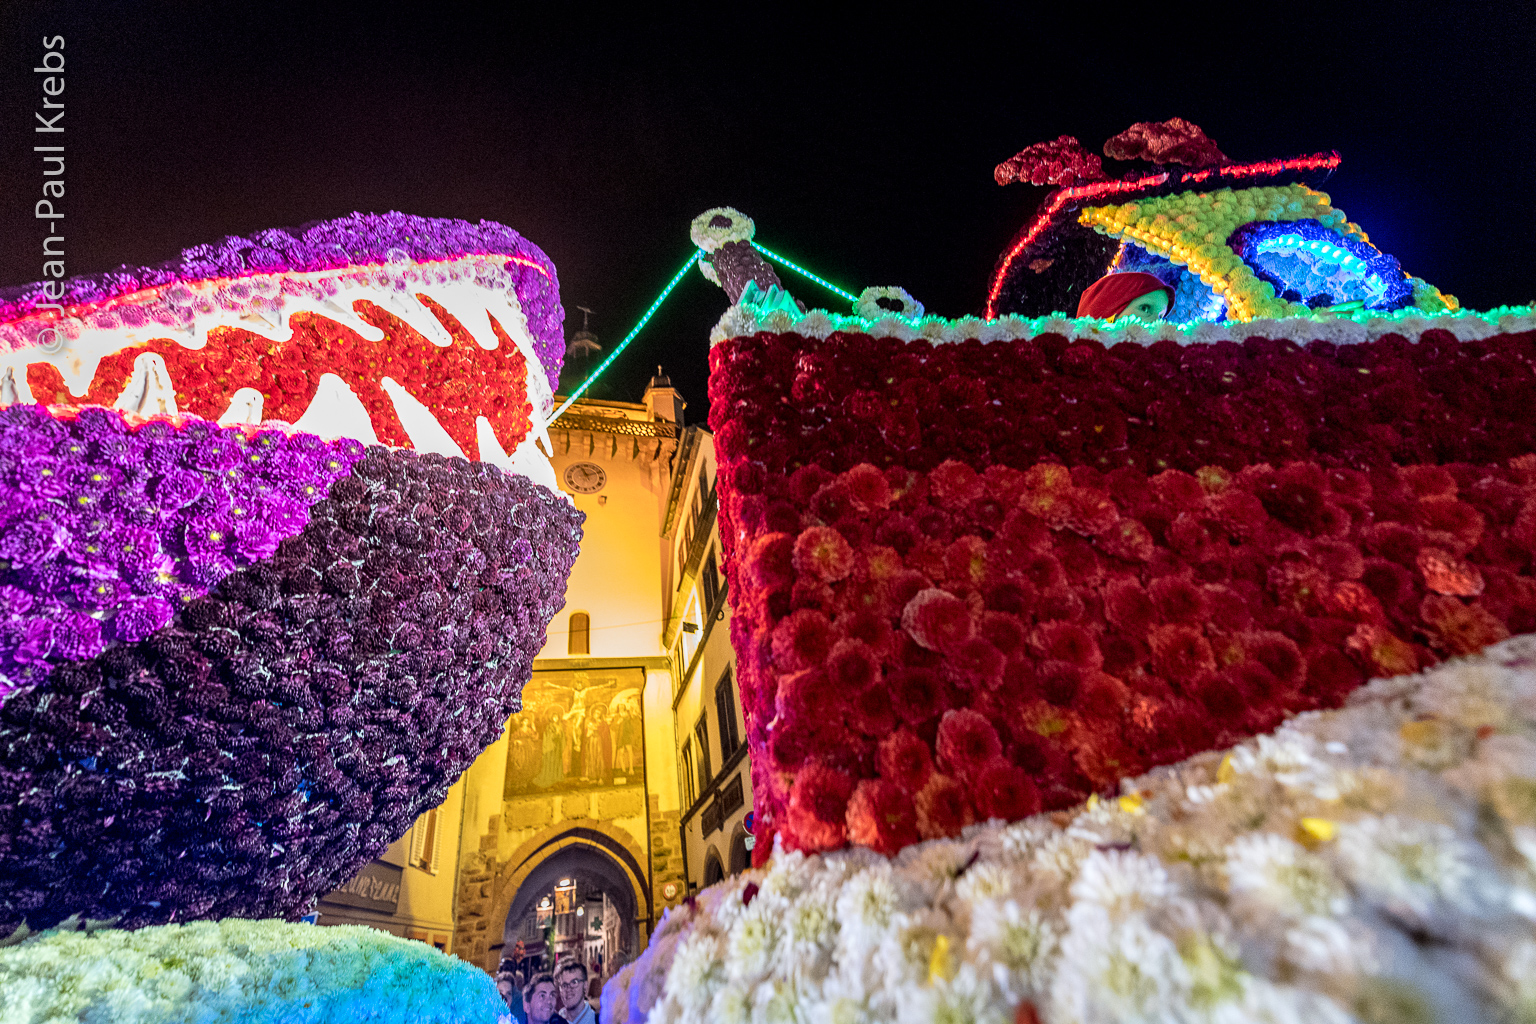 fleurs \u2013 Bons baisers du Rhin Supérieur